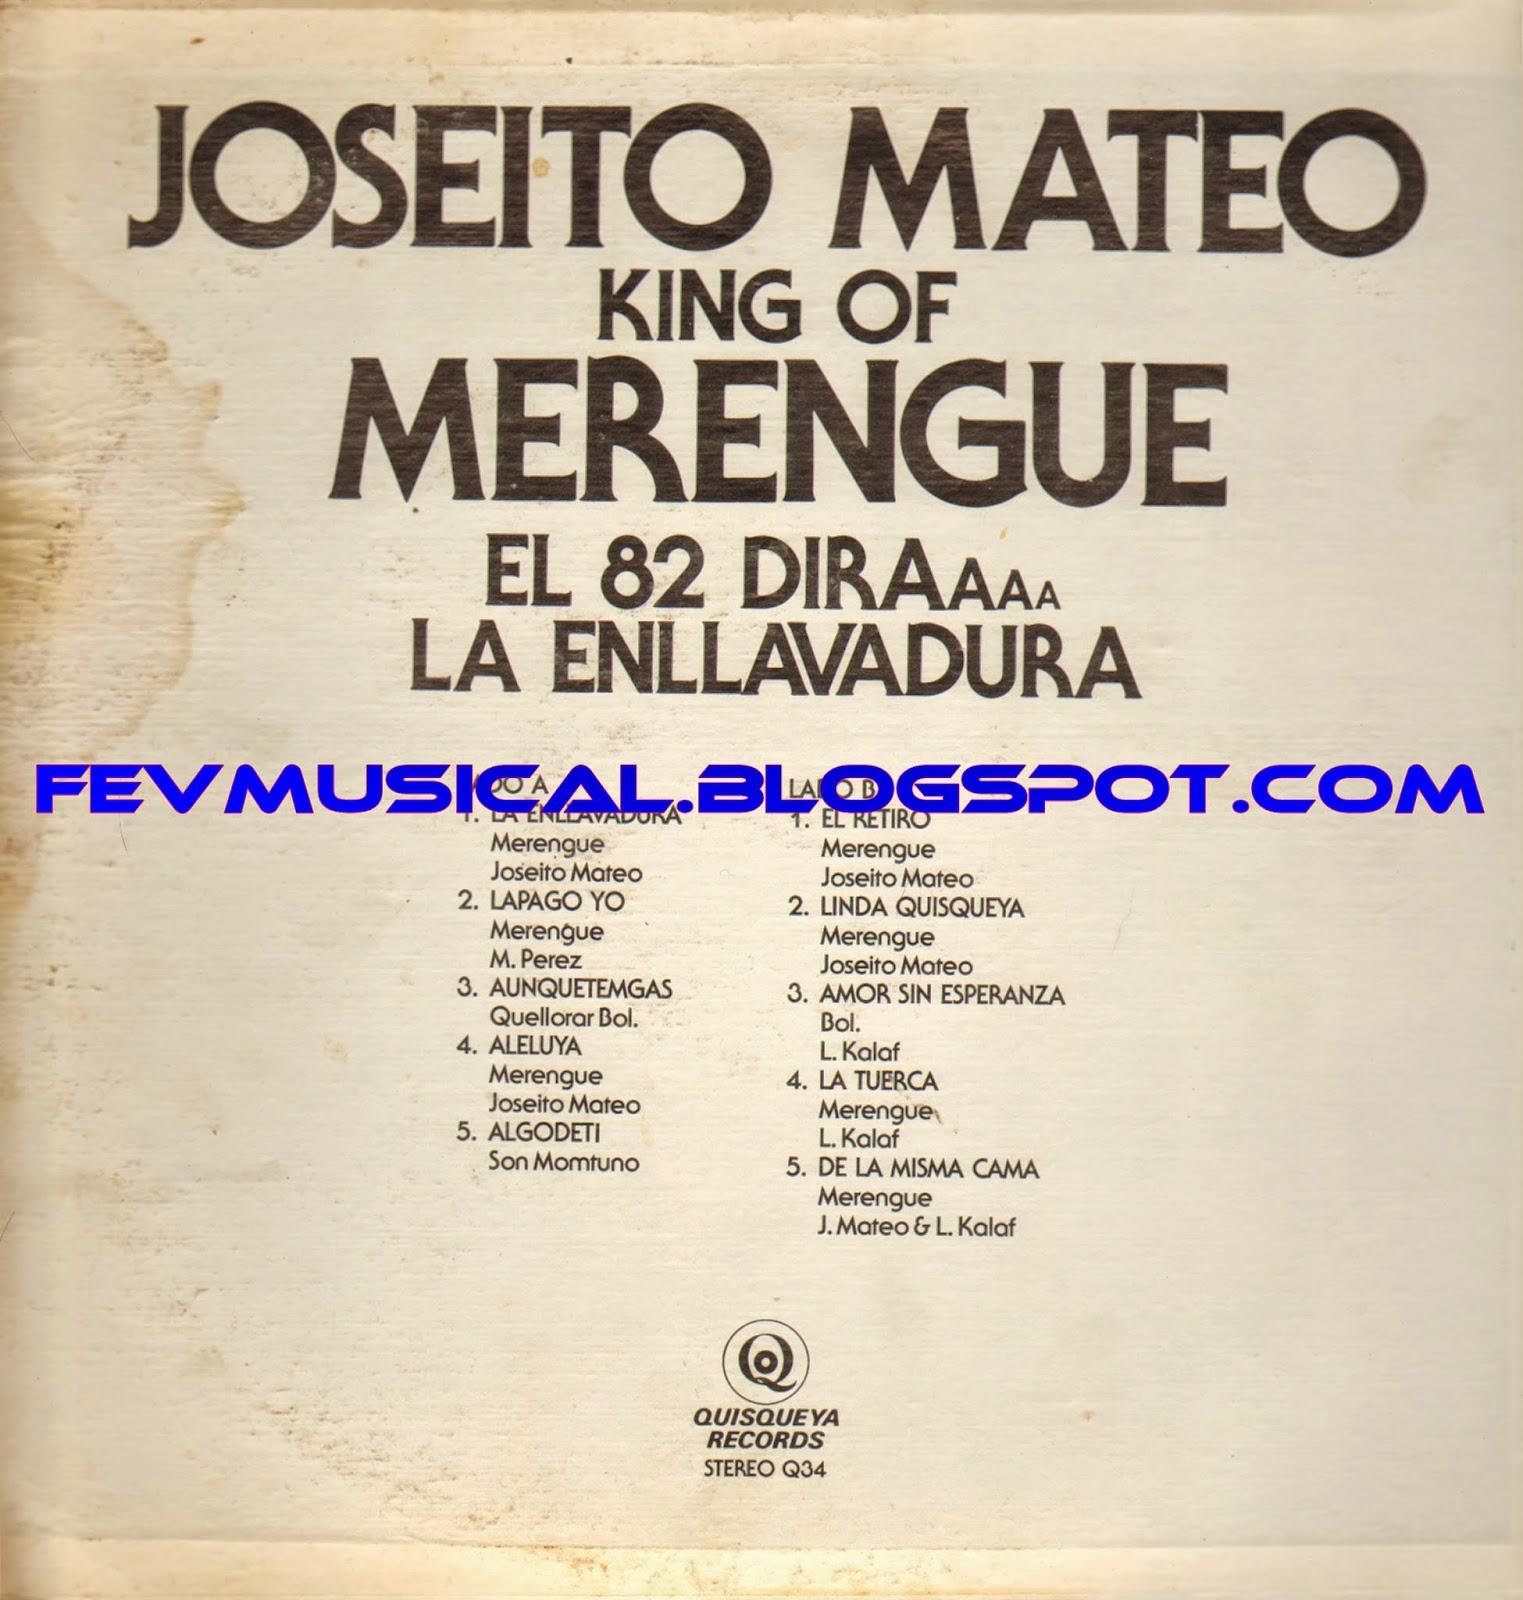 Joseito Mateo King Of Merengue